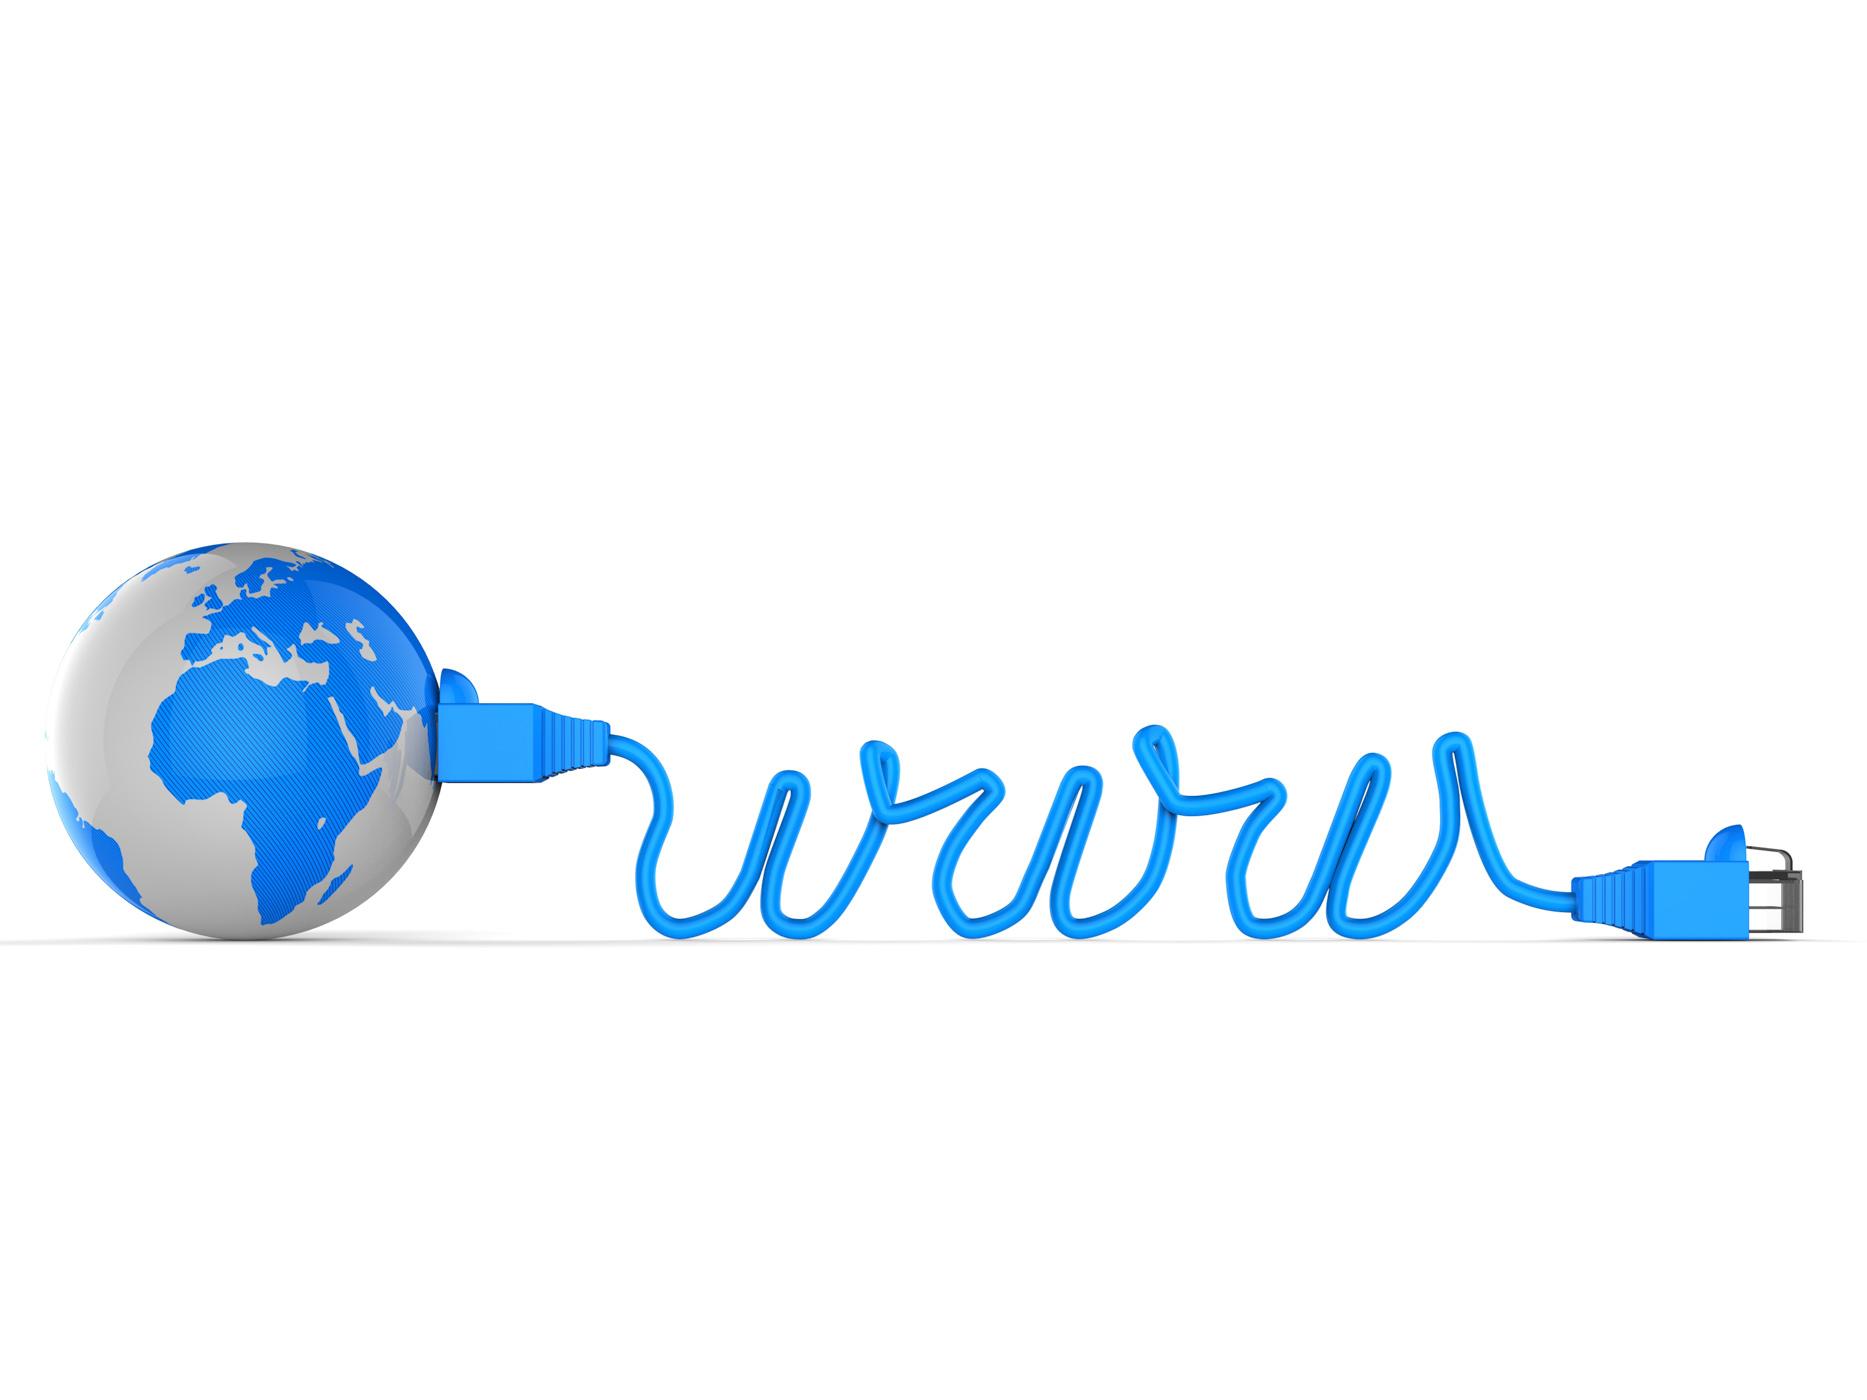 Worldwide web represents computer network and communication photo